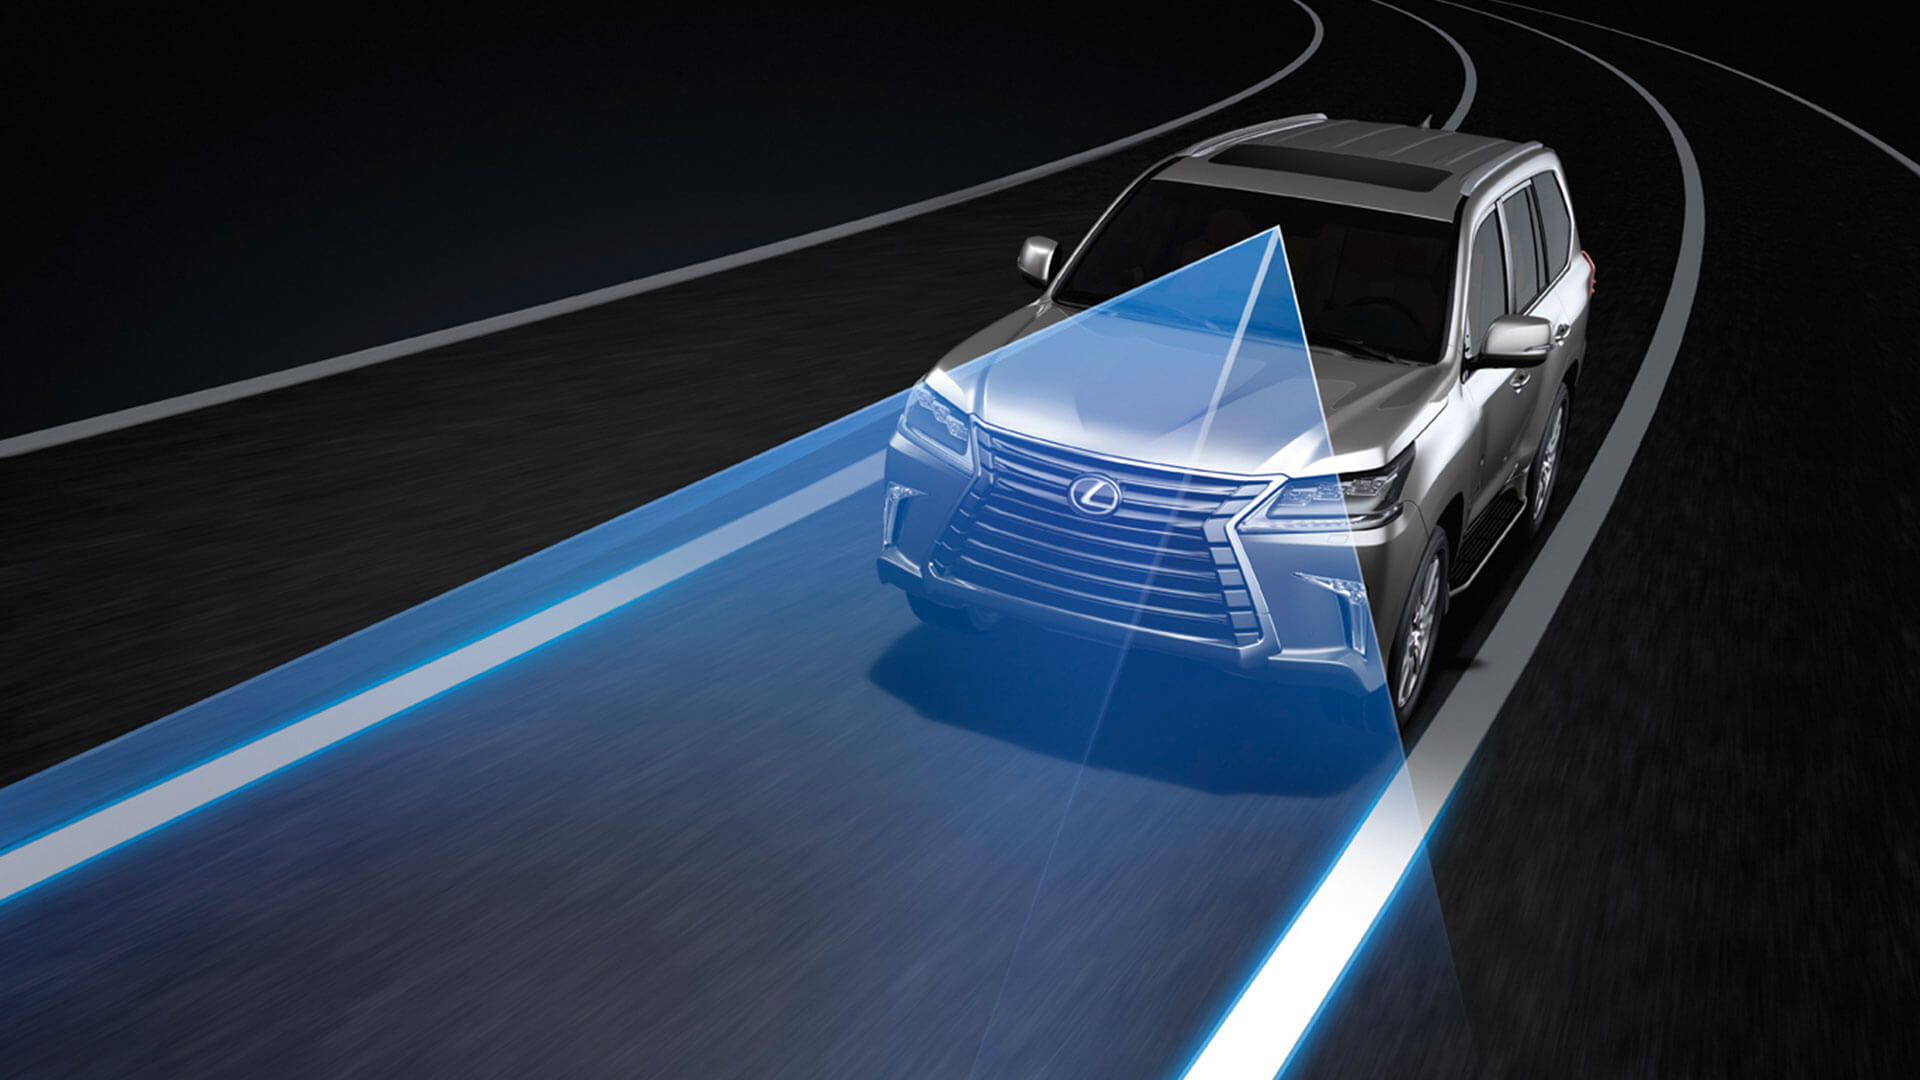 2017 lexus lx 570 features lane keep assist